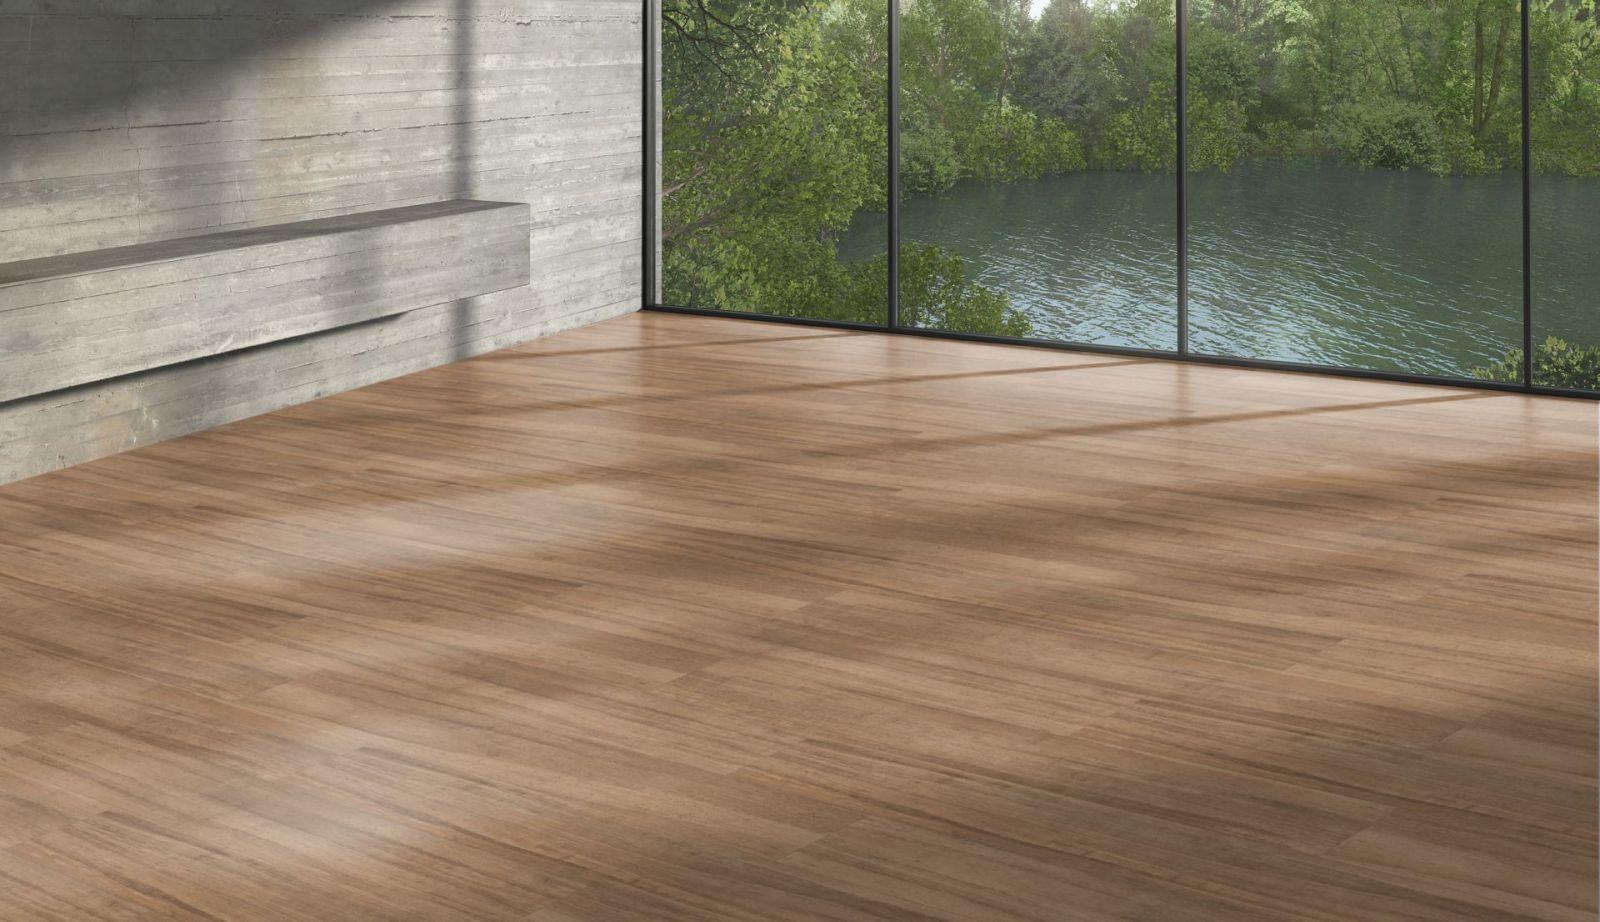 Parador suelos laminados tarimas flotantes maderas for Suelos laminados parador